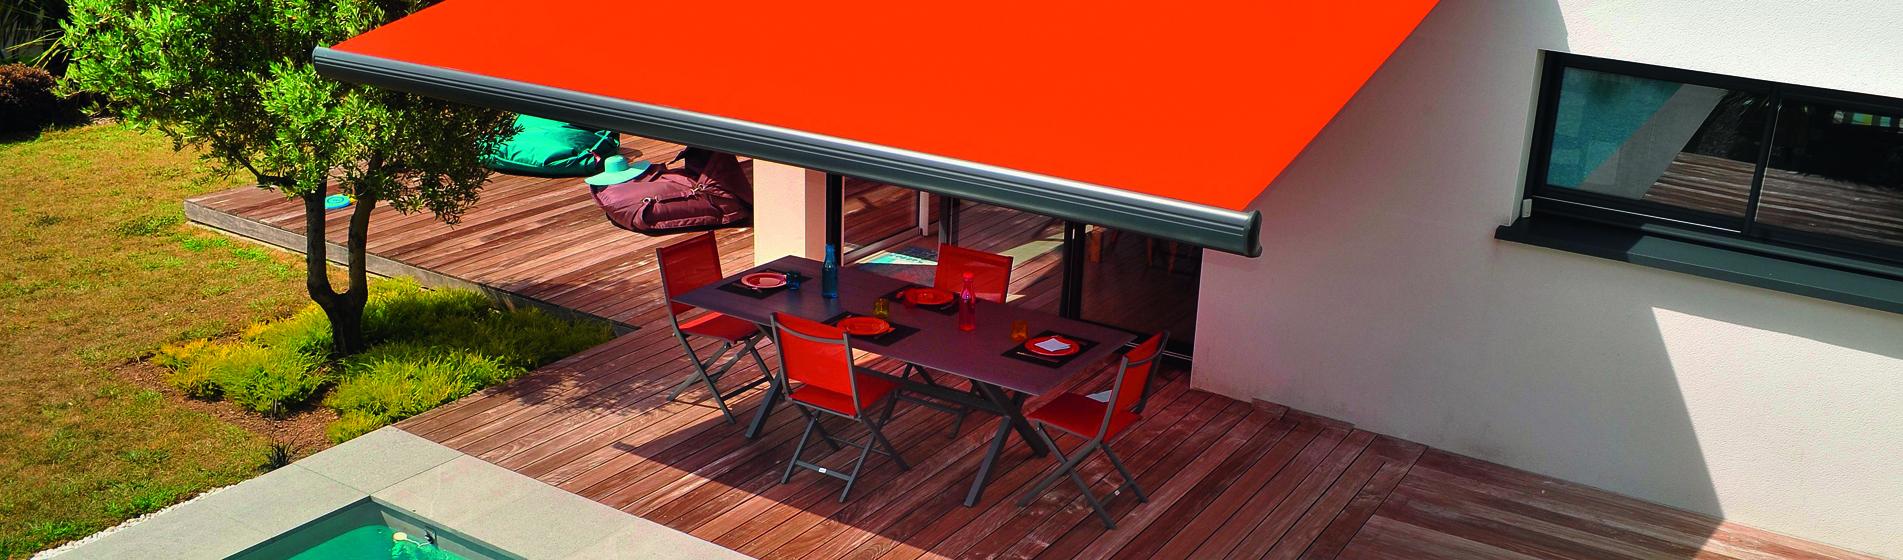 rénovation store banne terrasse 30 Gard